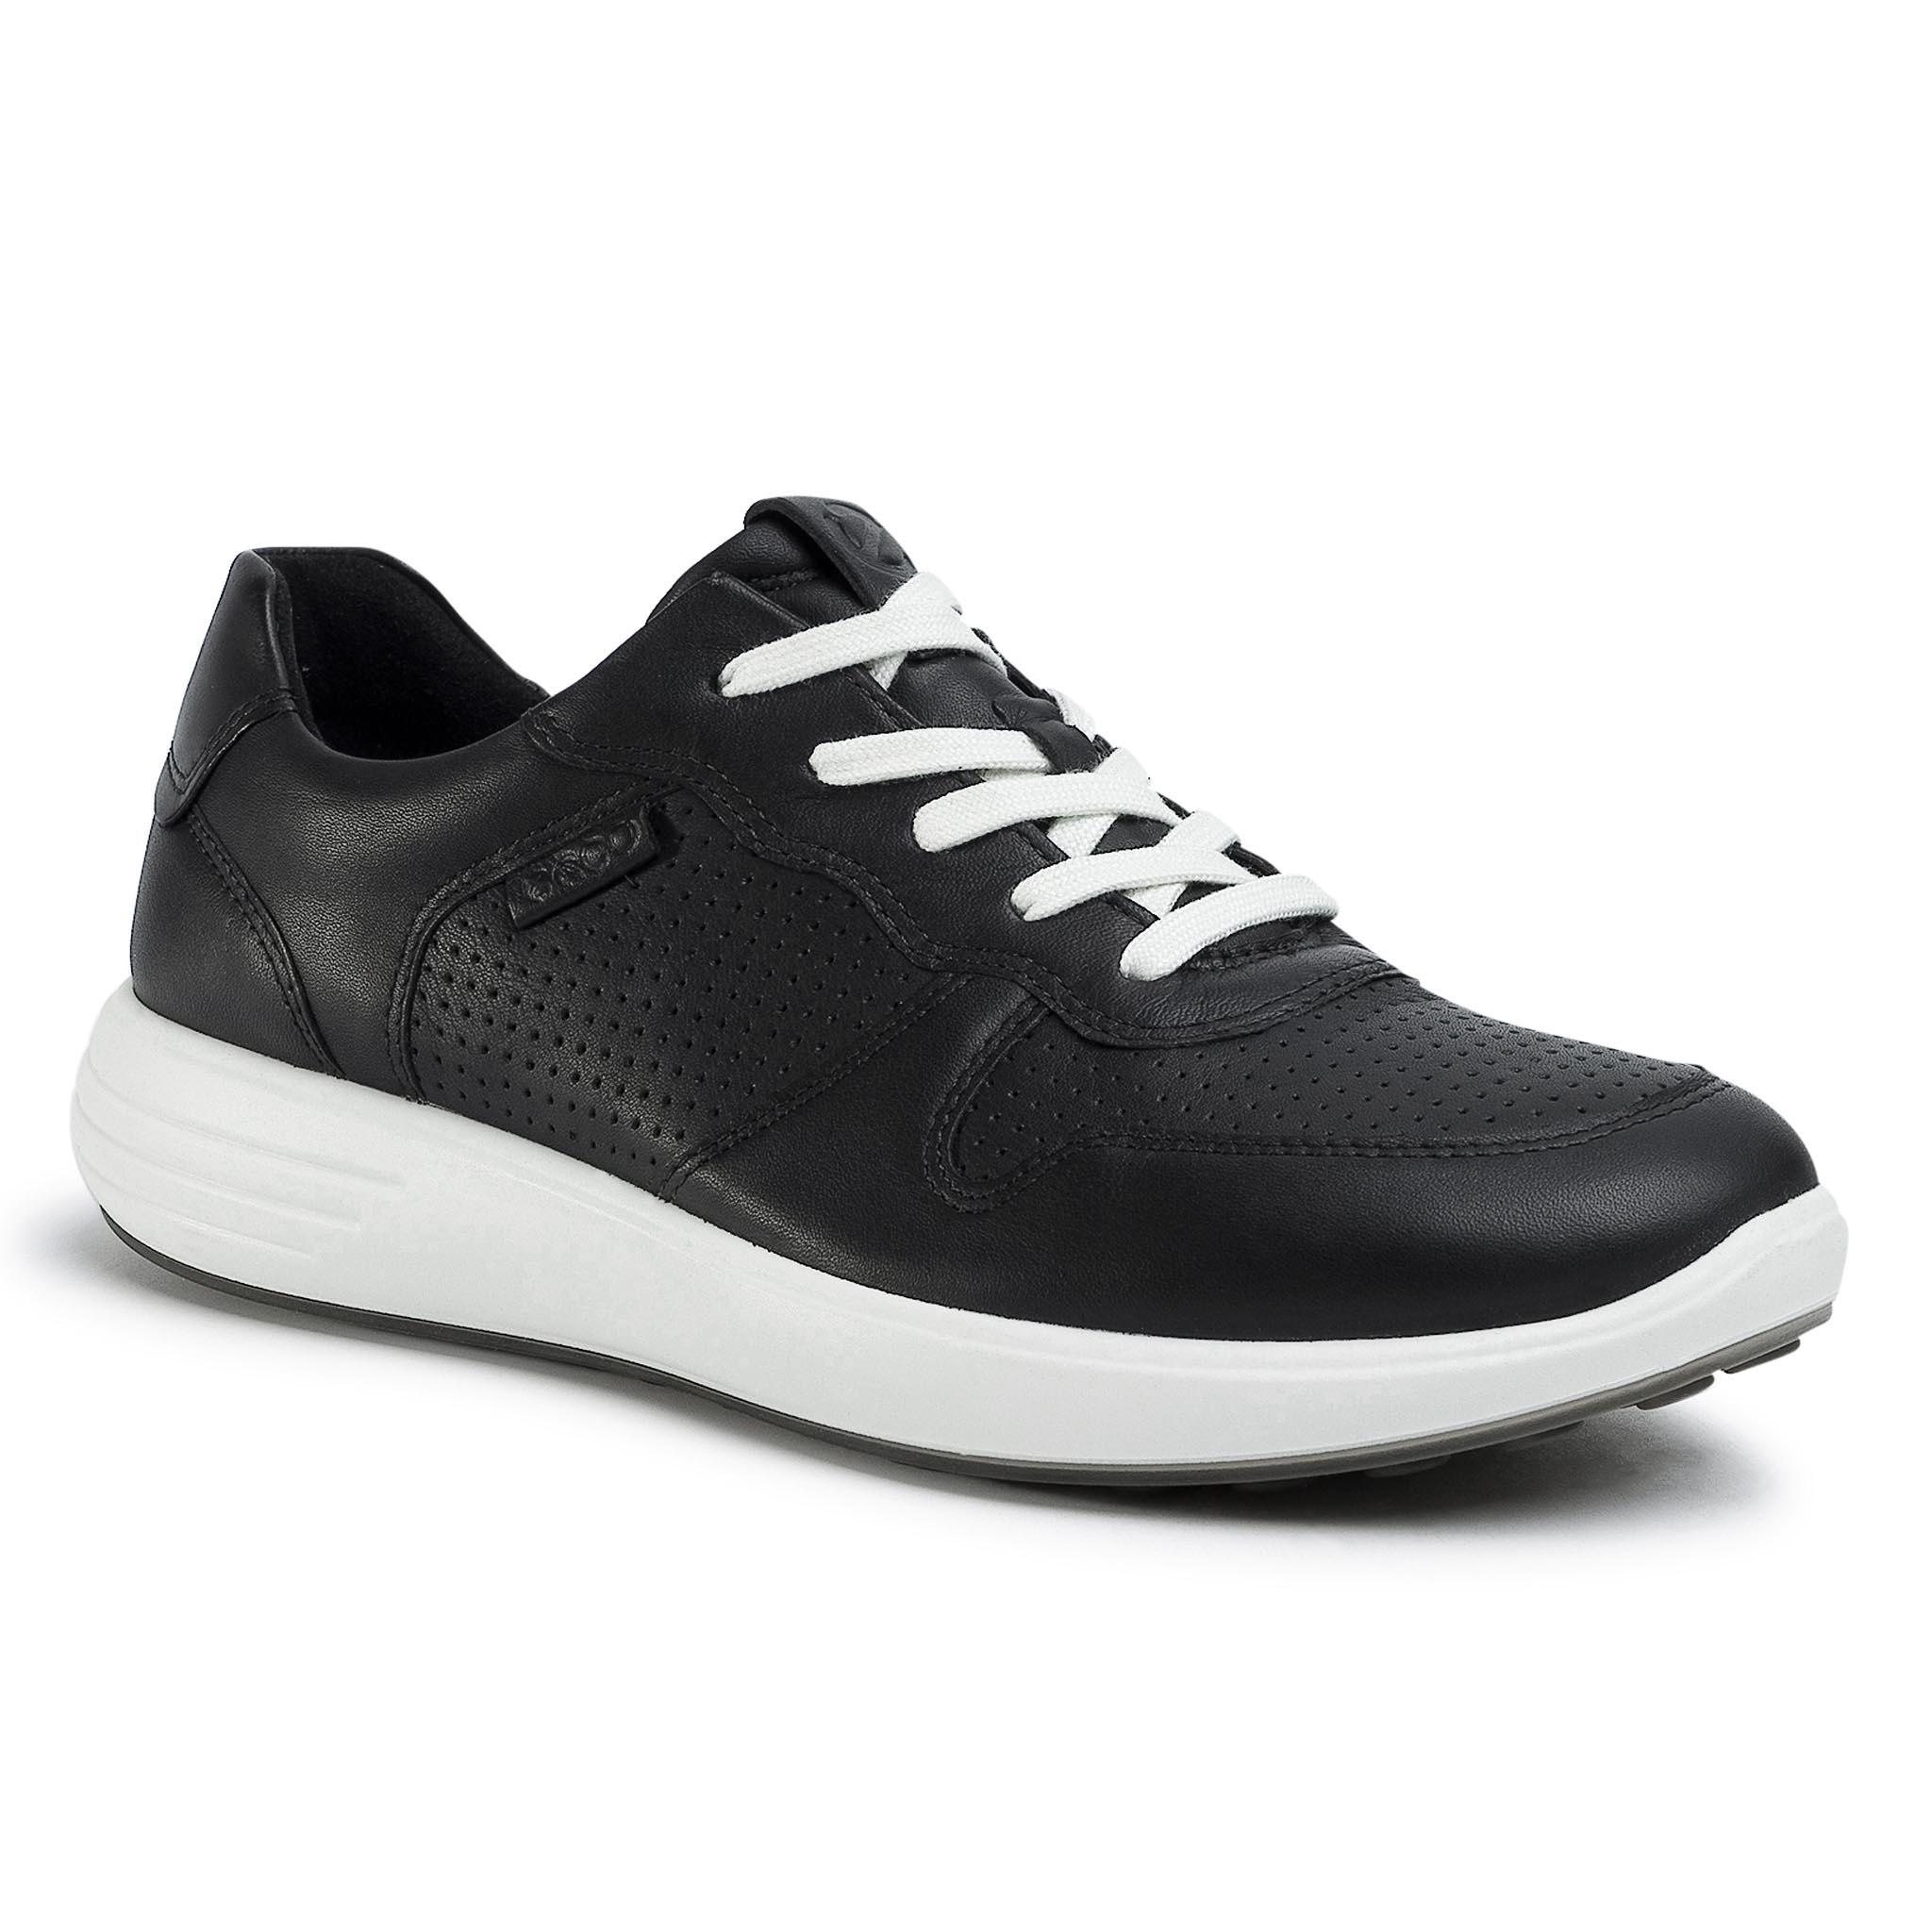 Sneakers ECCO - Soft 7 Runner M 46063451052  Black/Black